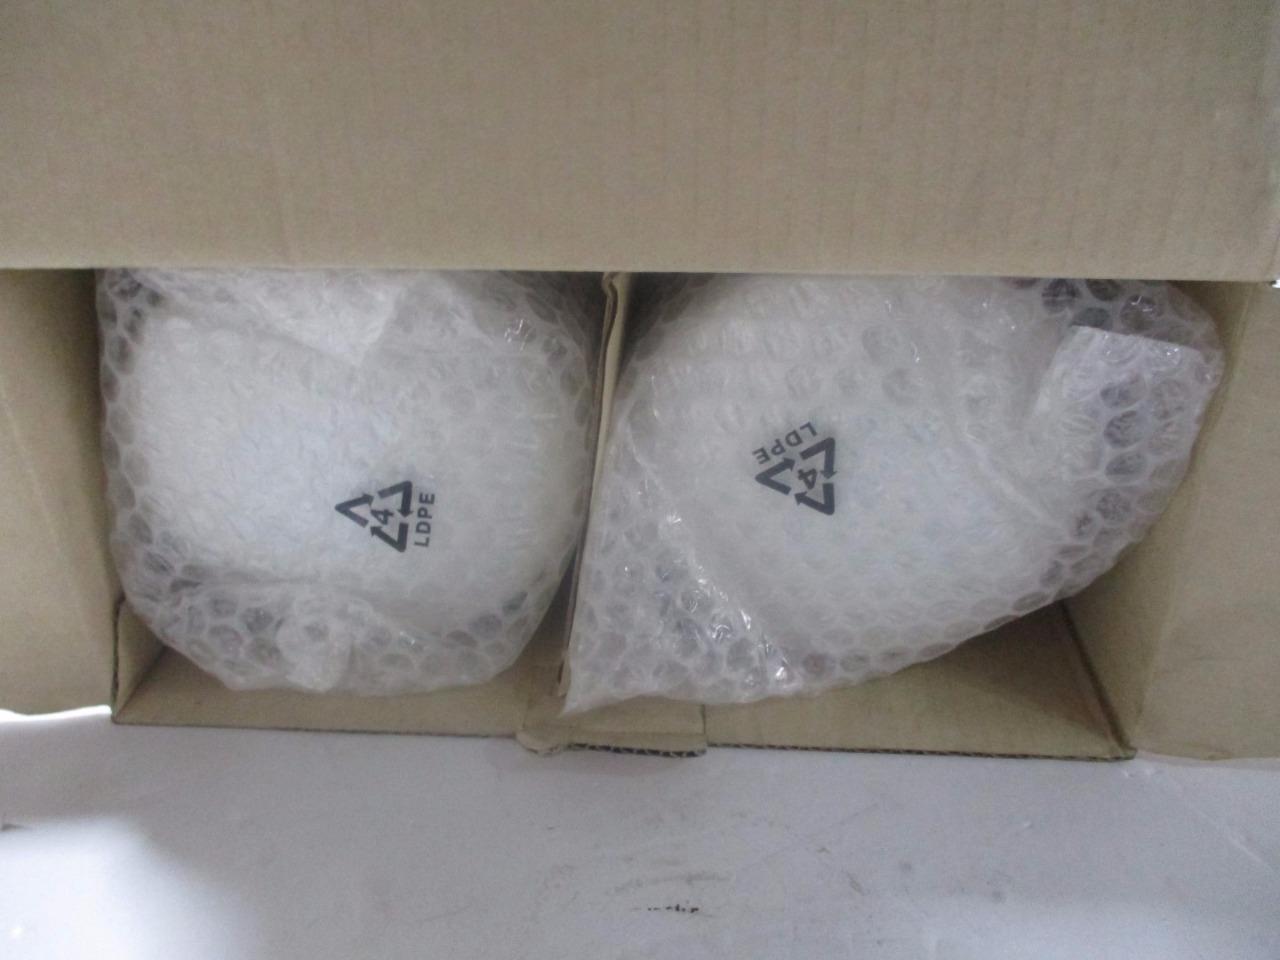 2 FILTER IN BOX HP Indigo B1B29A 3000 5000 Imaging Oil Filter 10 MICRON